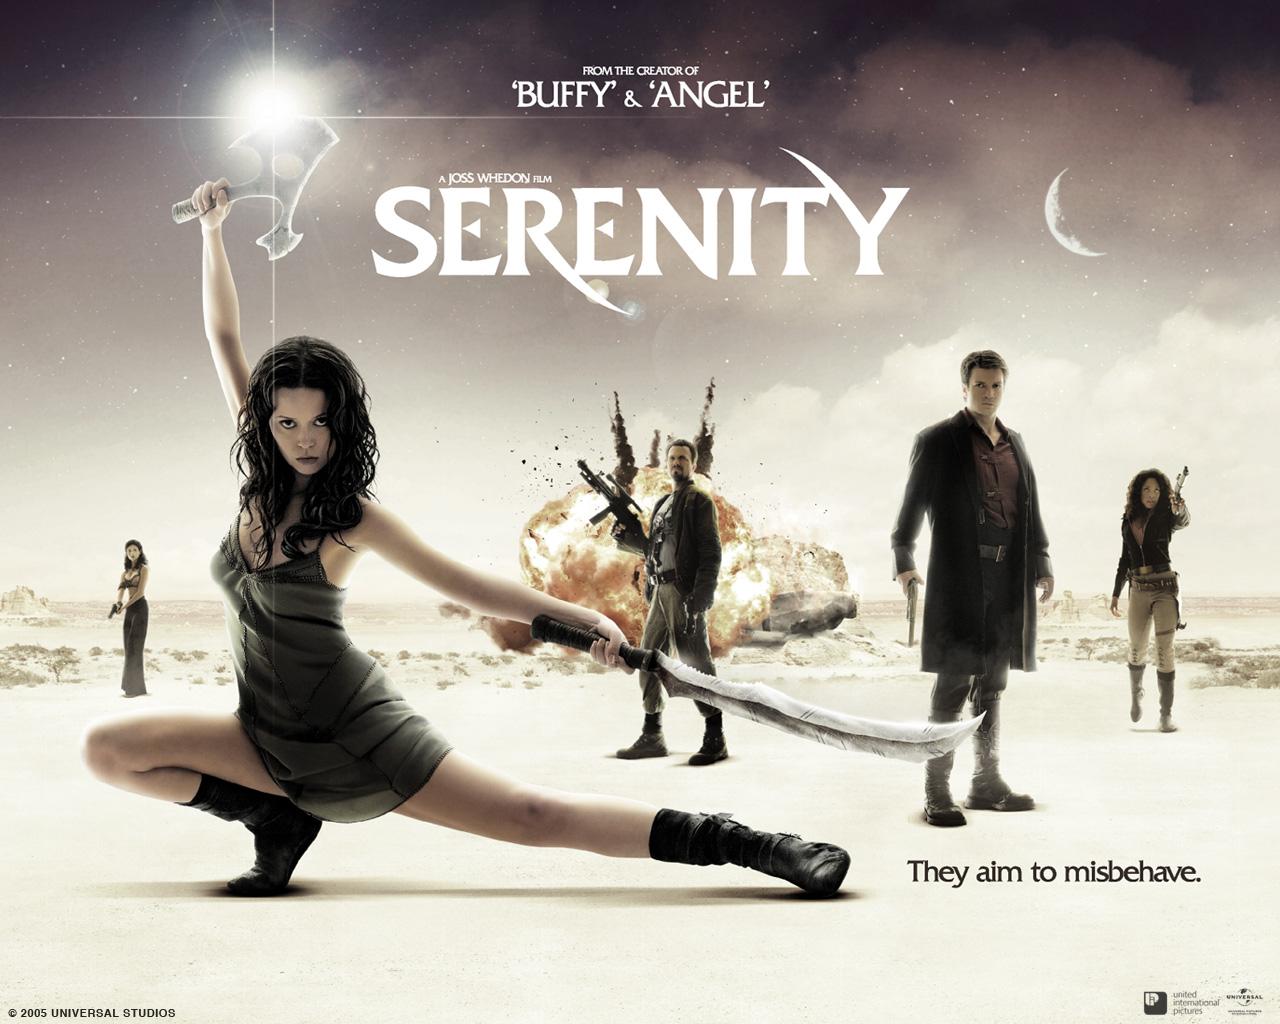 http://2.bp.blogspot.com/-3Ezs9sEH9dg/TmwStONlk7I/AAAAAAAAAEk/e2ouMx-4t5U/s1600/Serenity_Official1_1280x1024.jpg